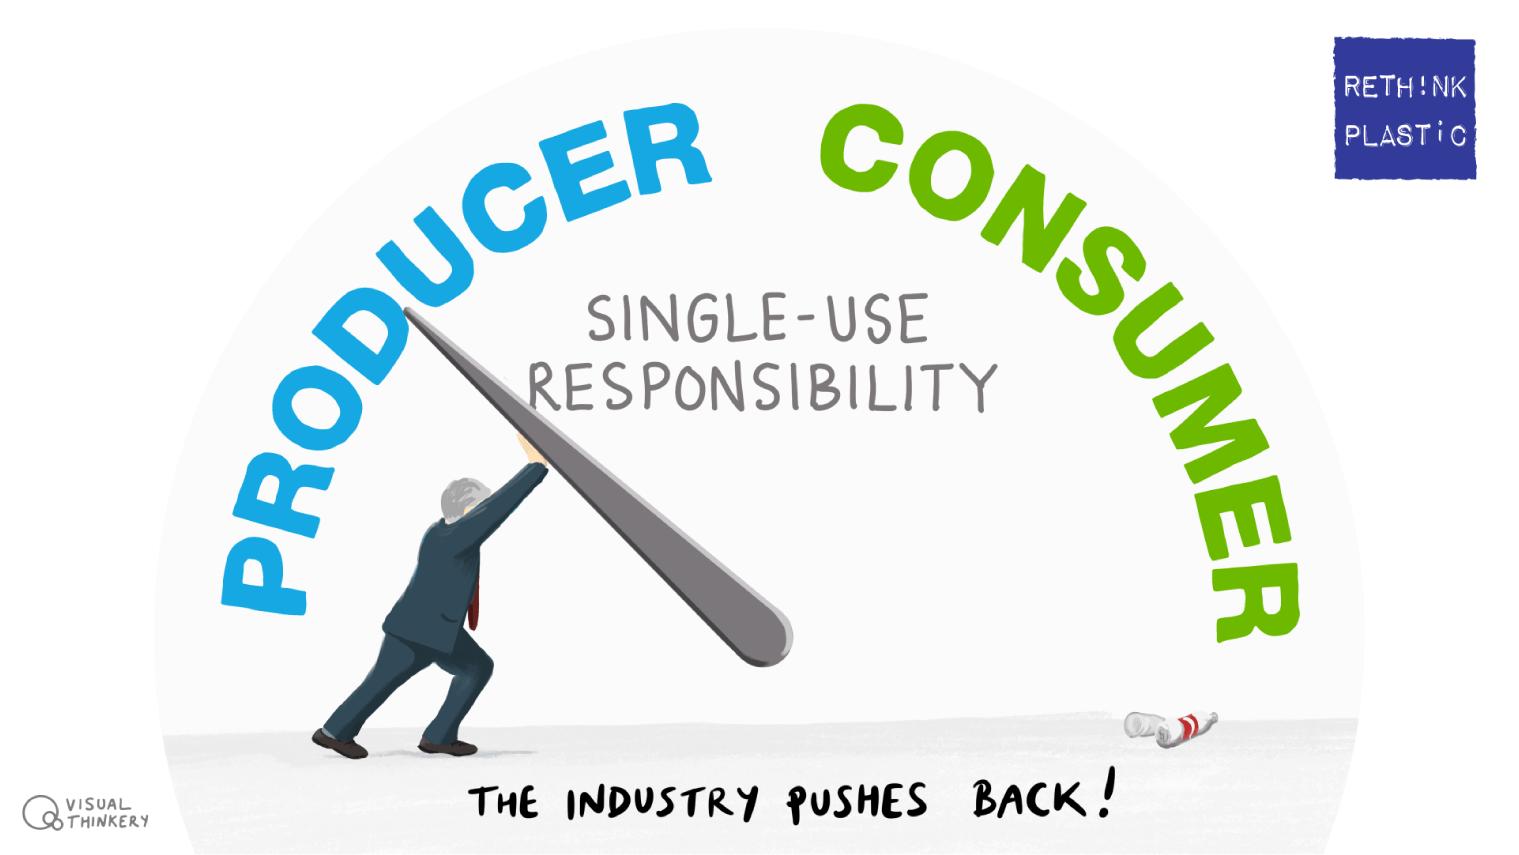 Rethink Plastic - Producer - Consumer